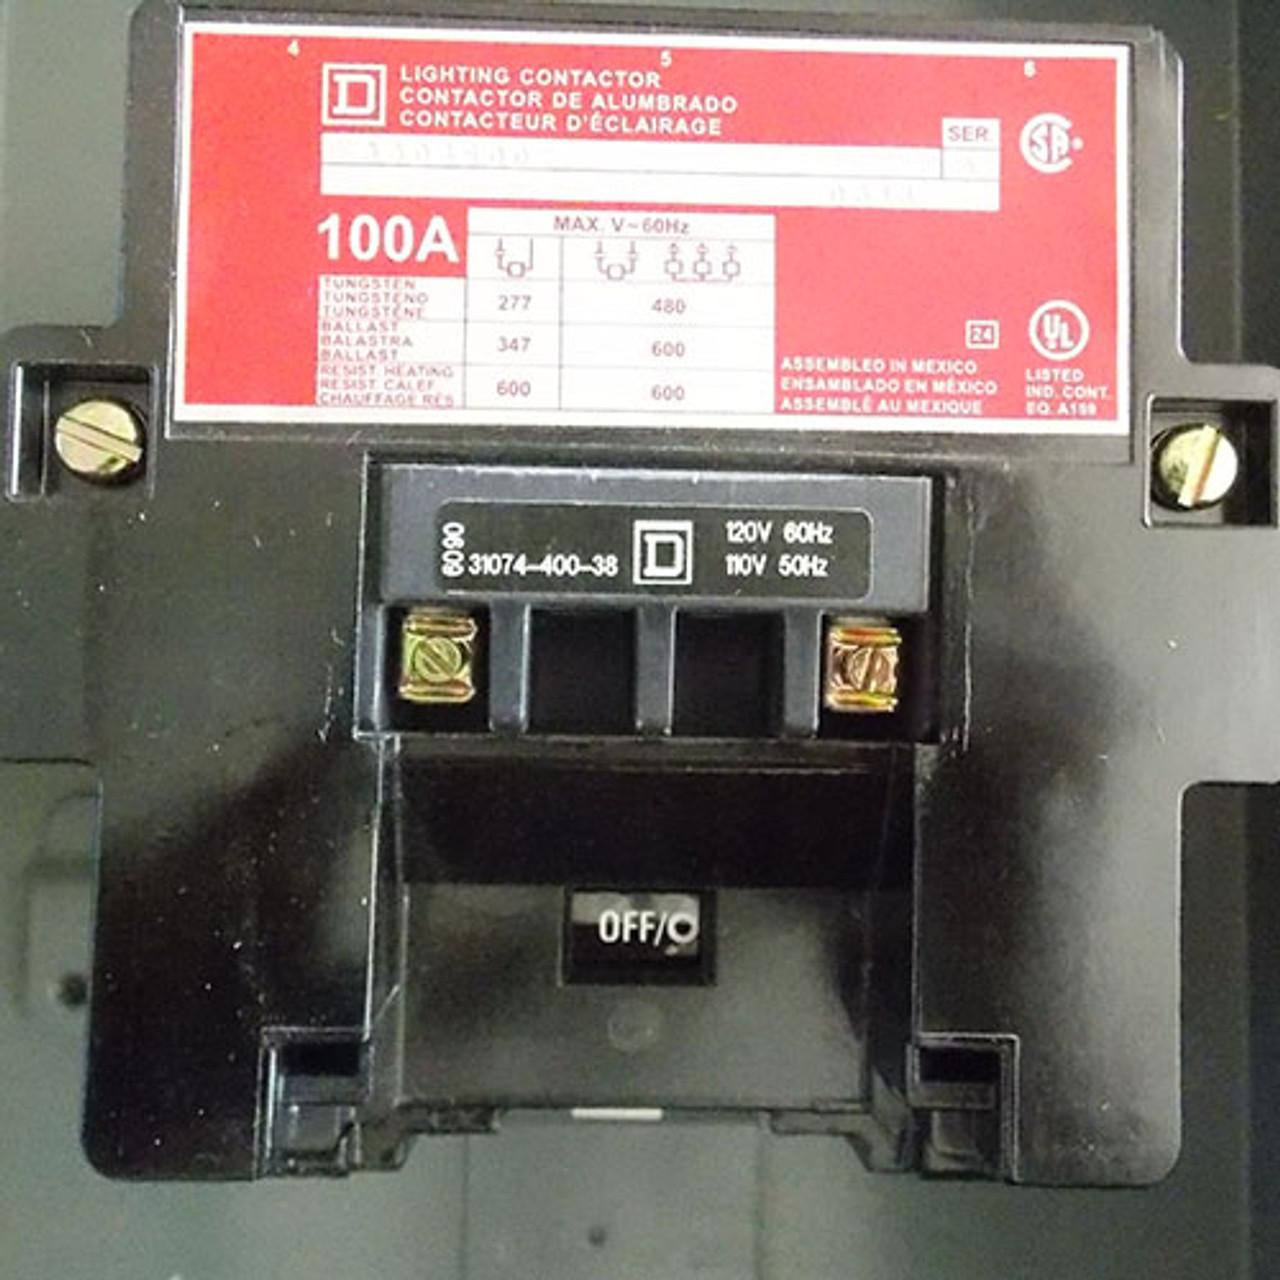 Square D 8903 SQO2 Lighting Contactor 100a Amp 277v-ac